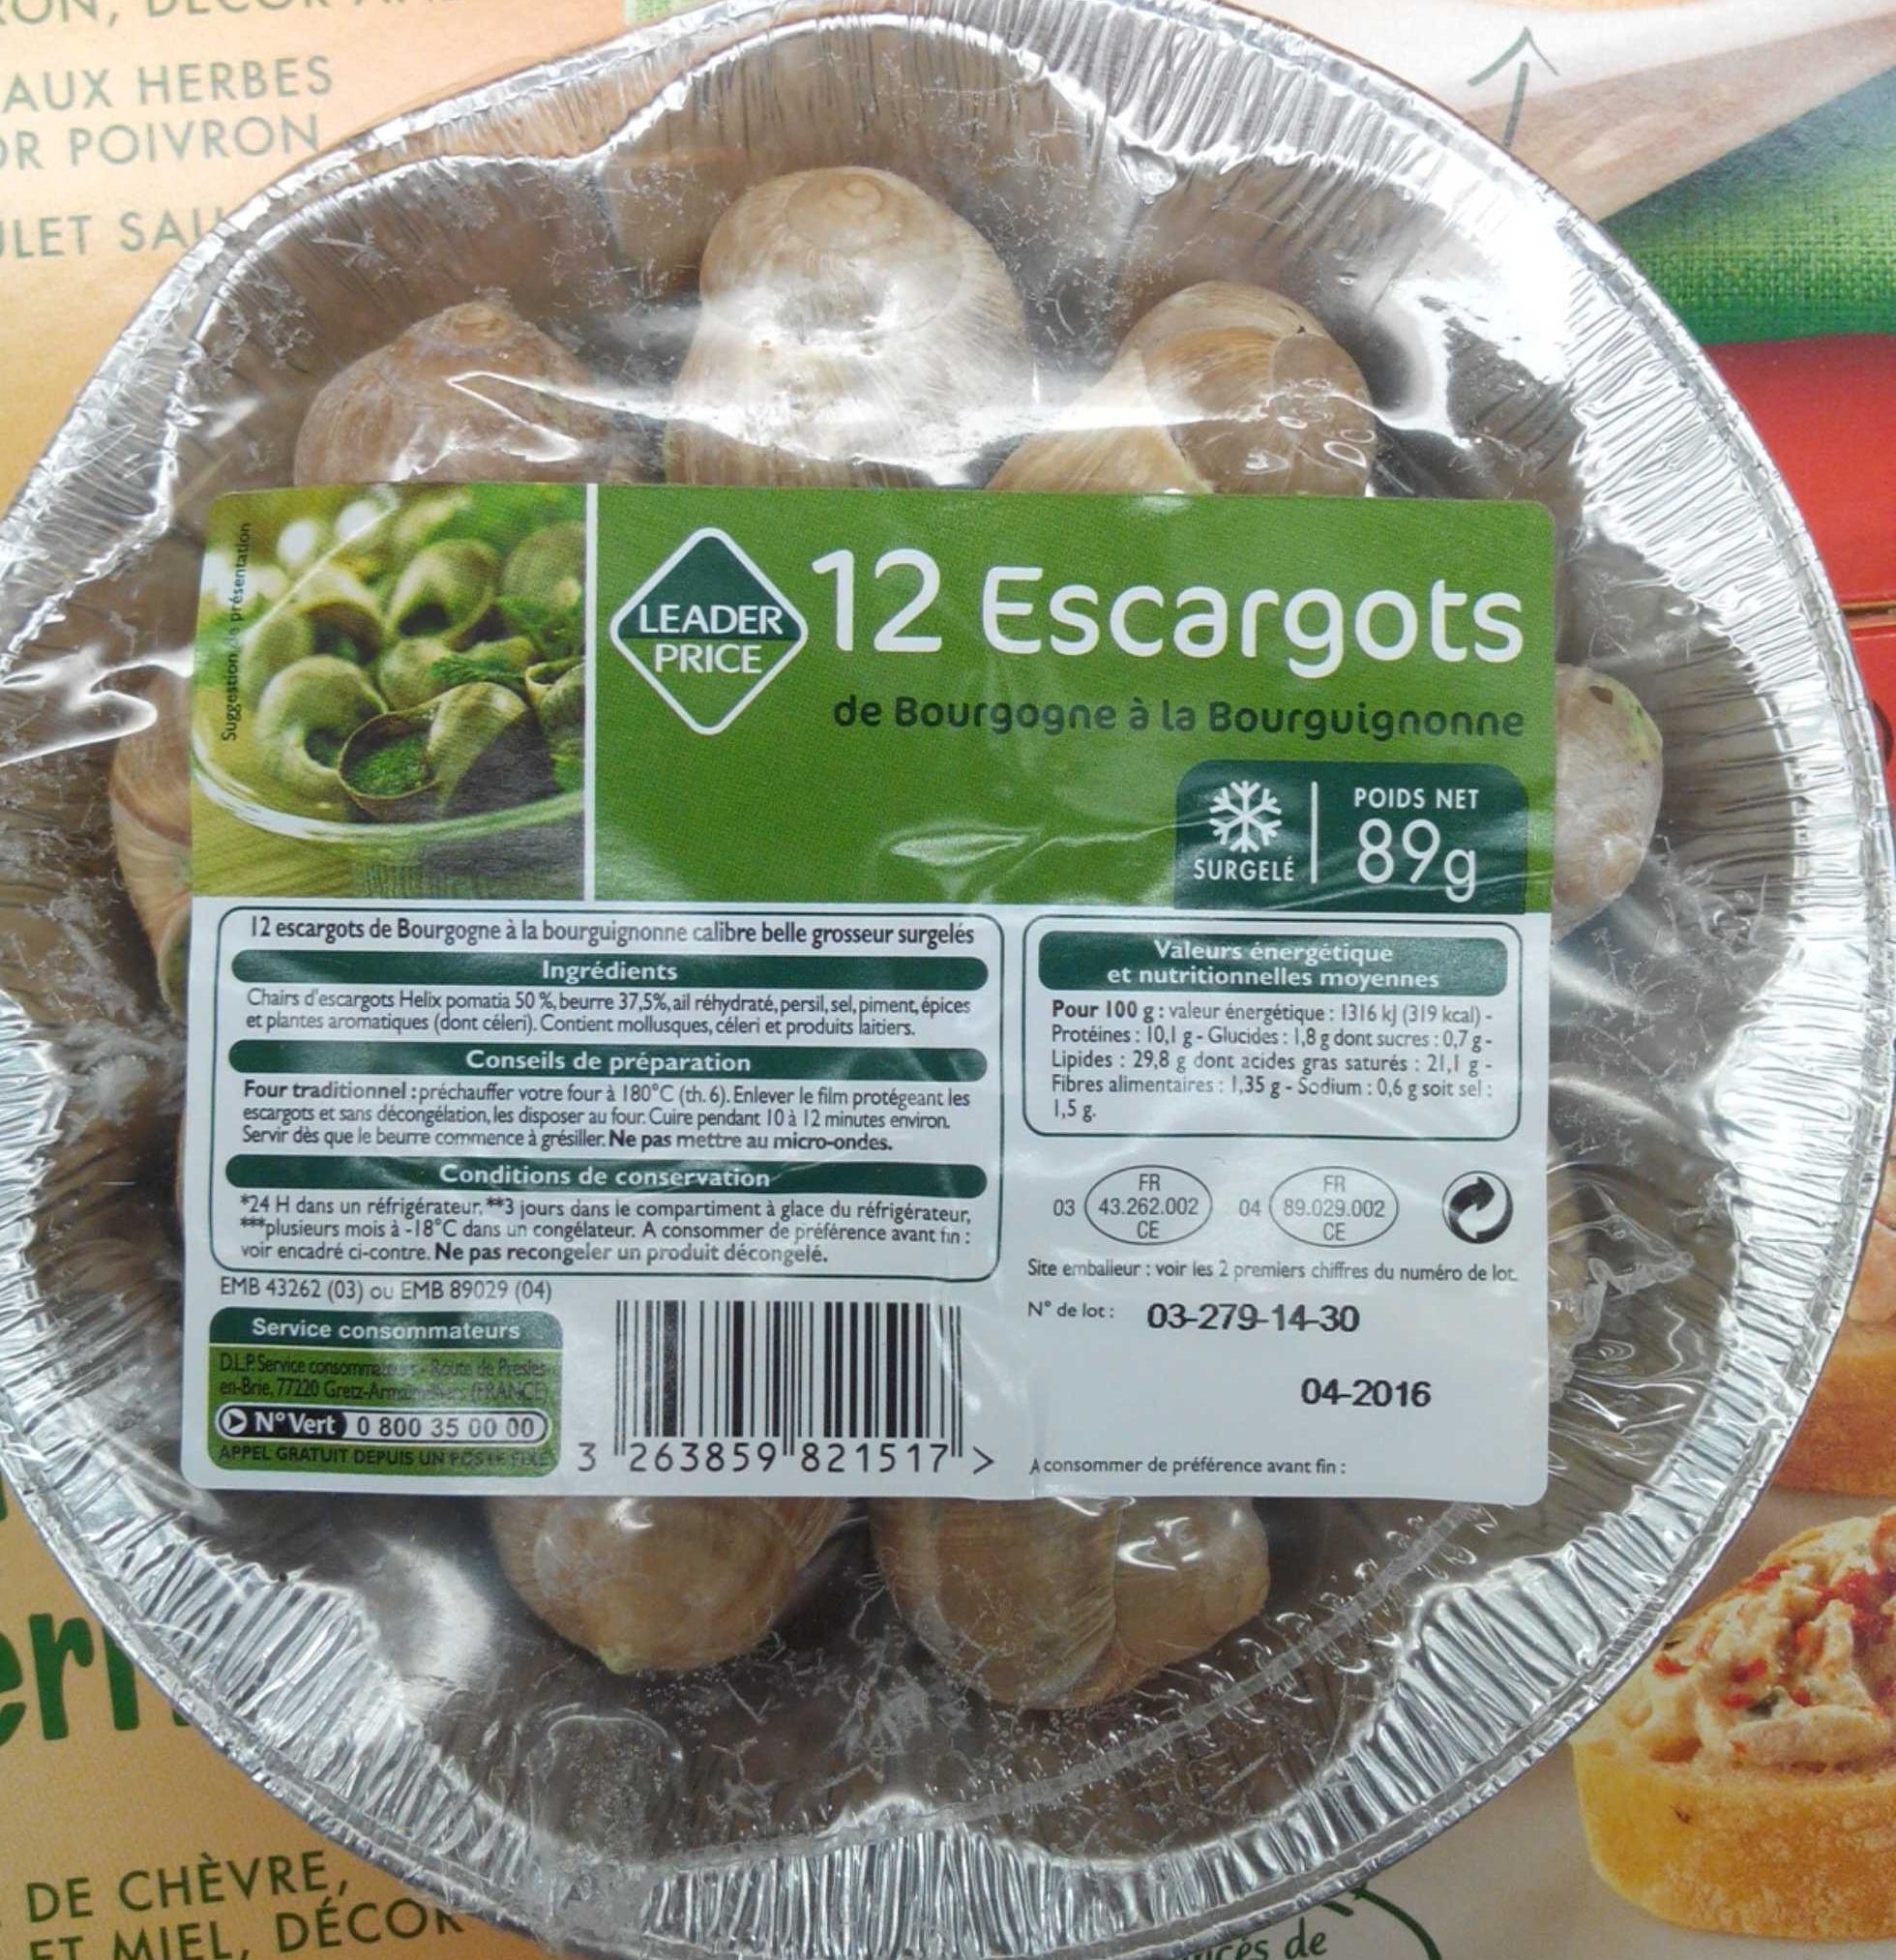 Escargot nutritional value